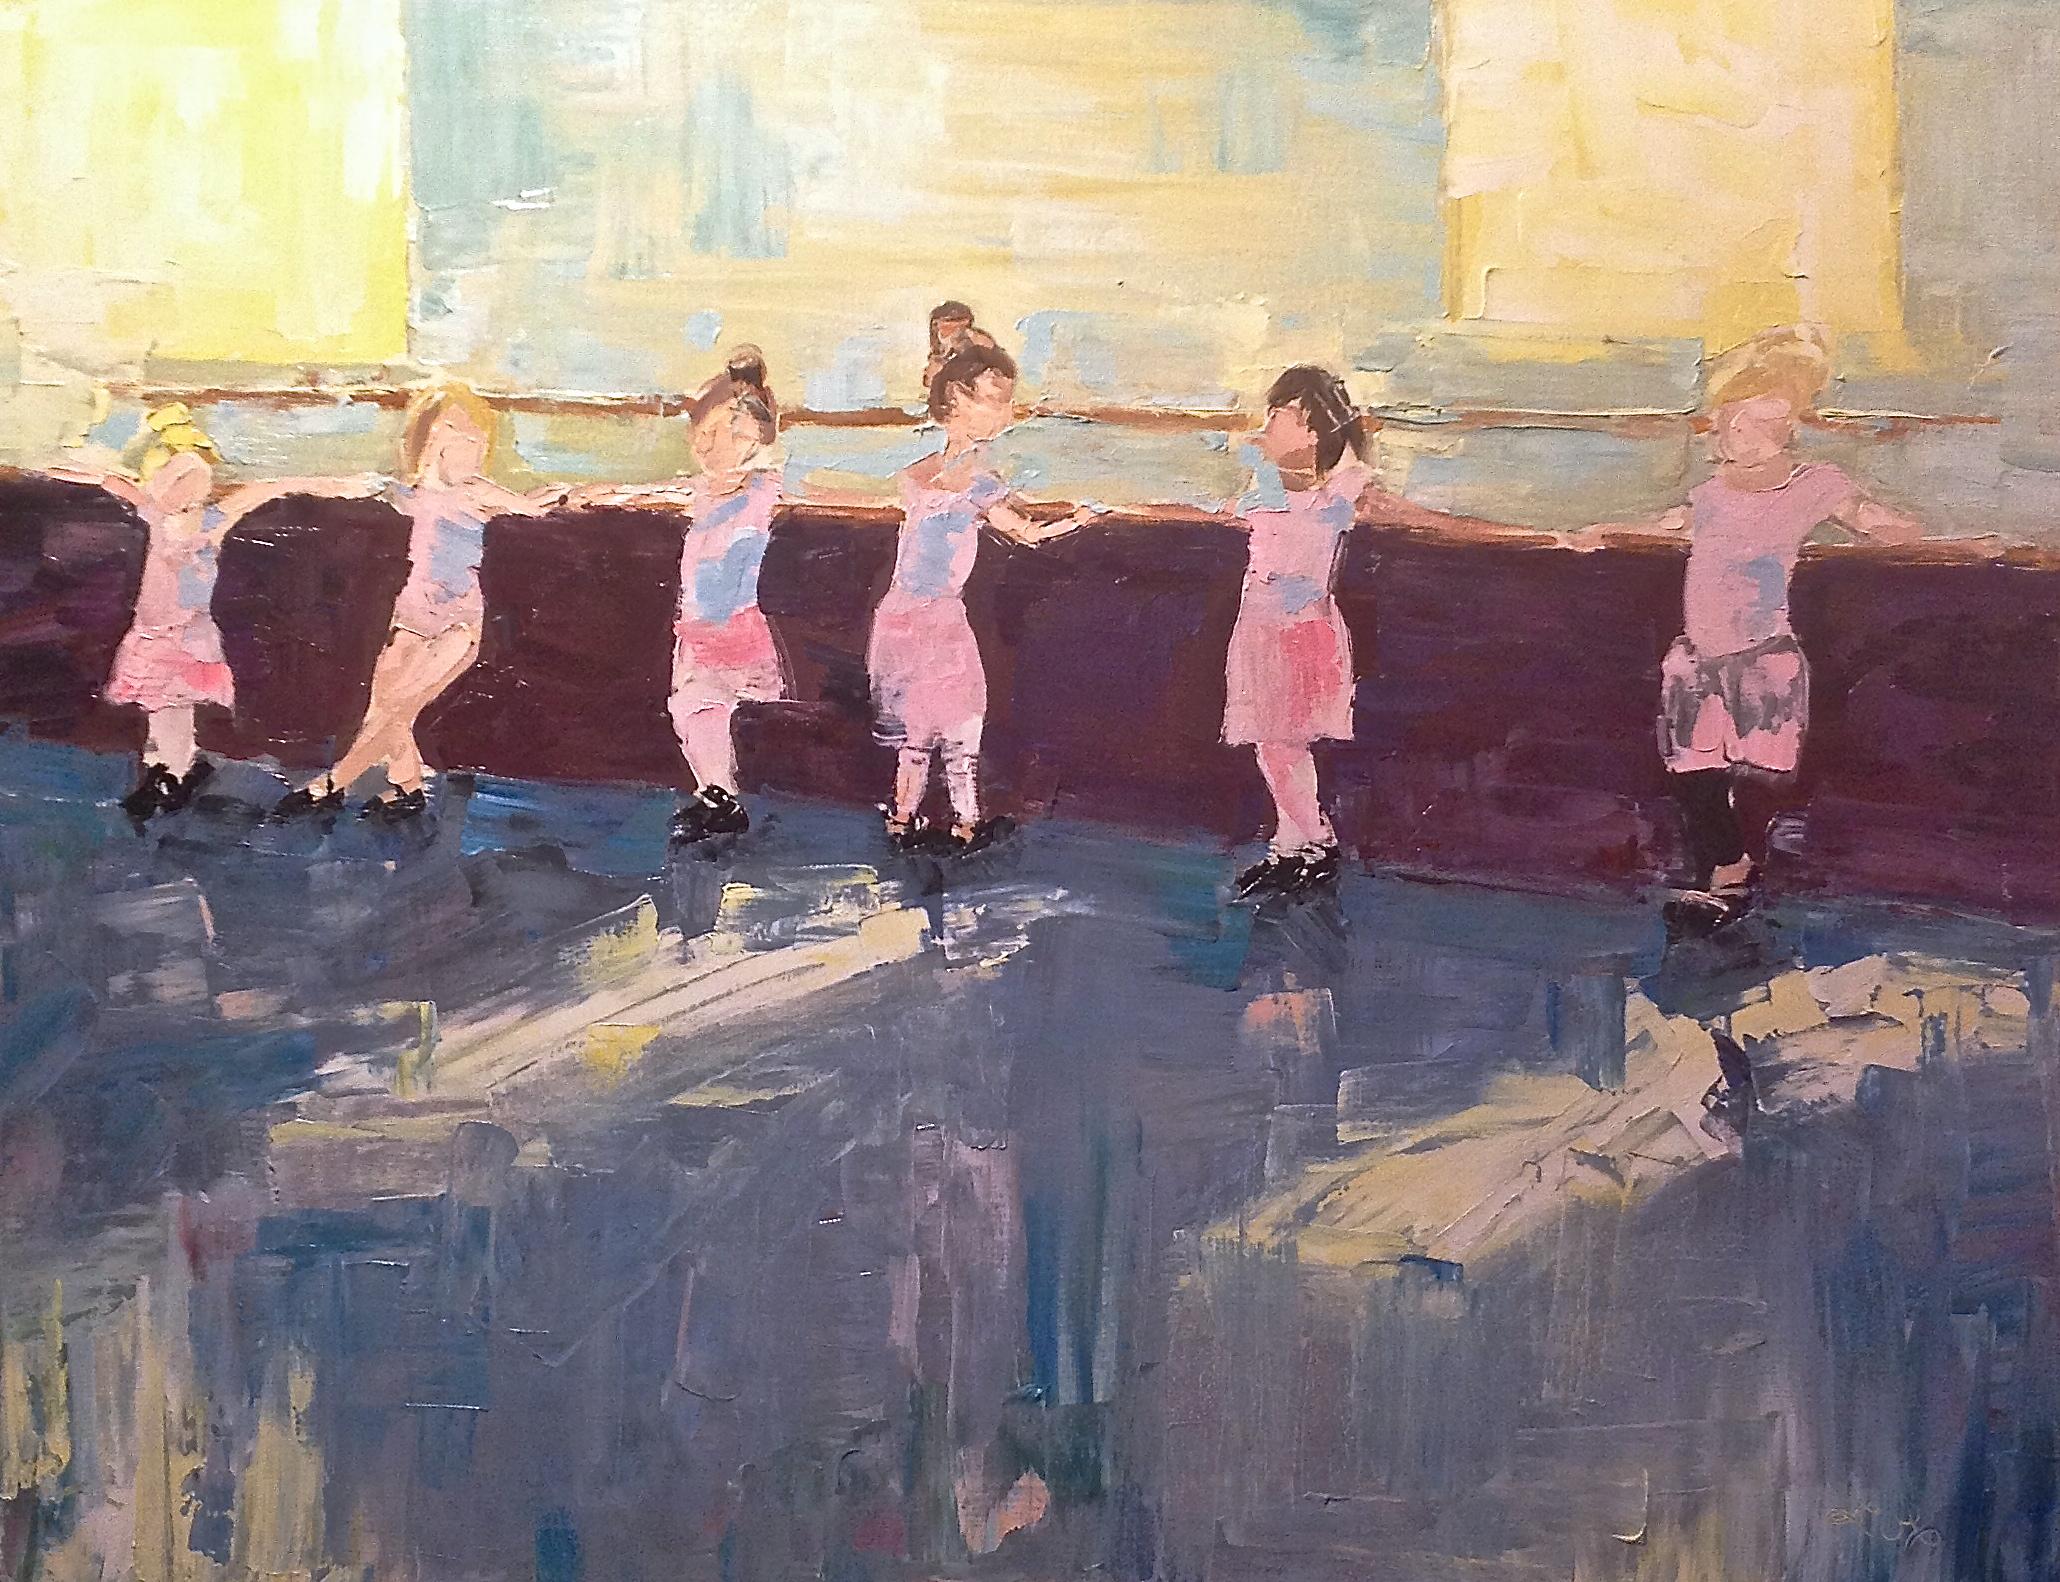 Les Petits Danseurs